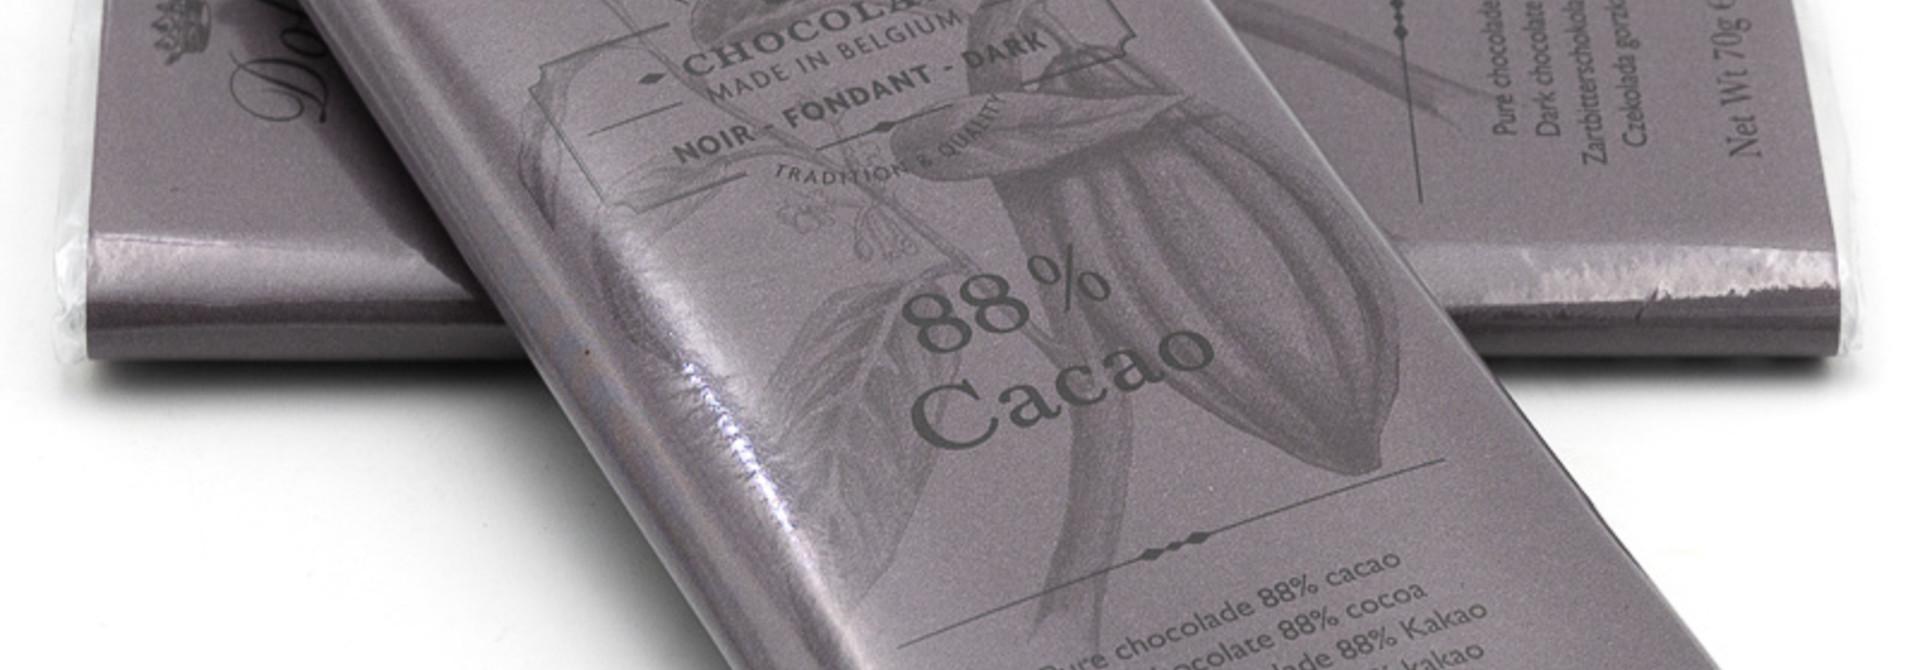 Dolfin dark chocolate 88% cocoa